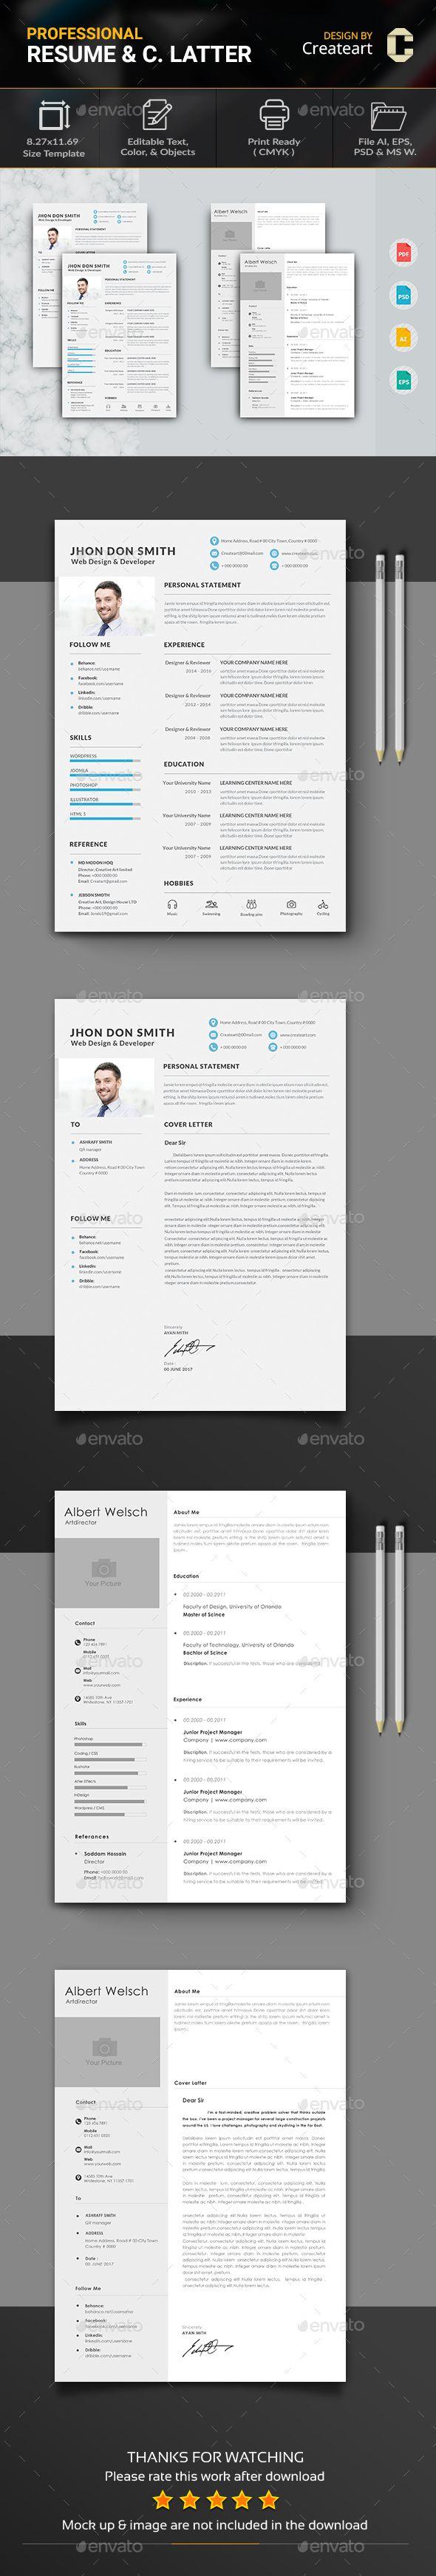 Simple Resume Exampleprin 299 Best Resume Cv Images On Pinterest  Resume Templates Creative .